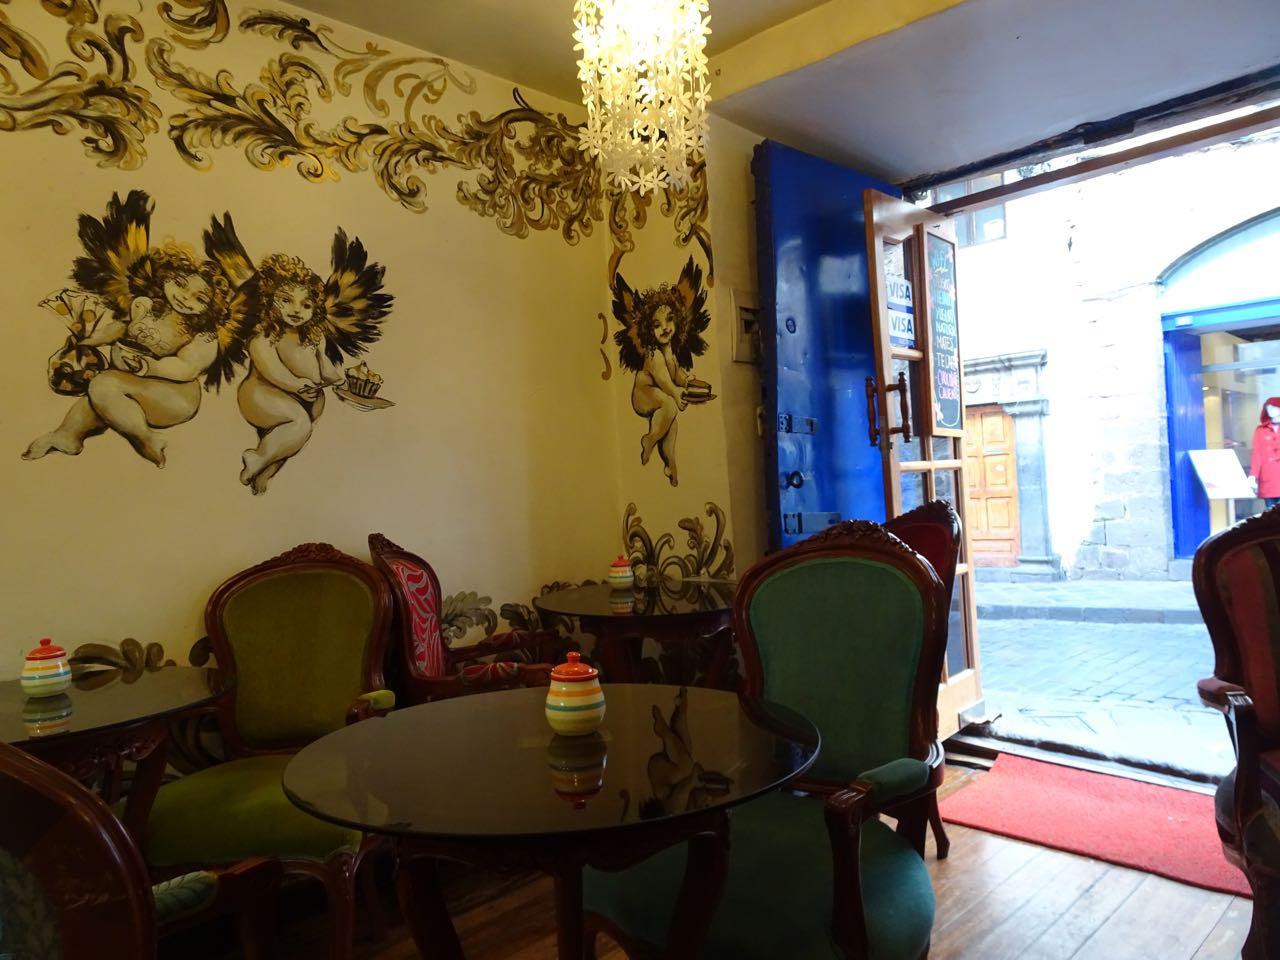 Tolle Cafés und Restis